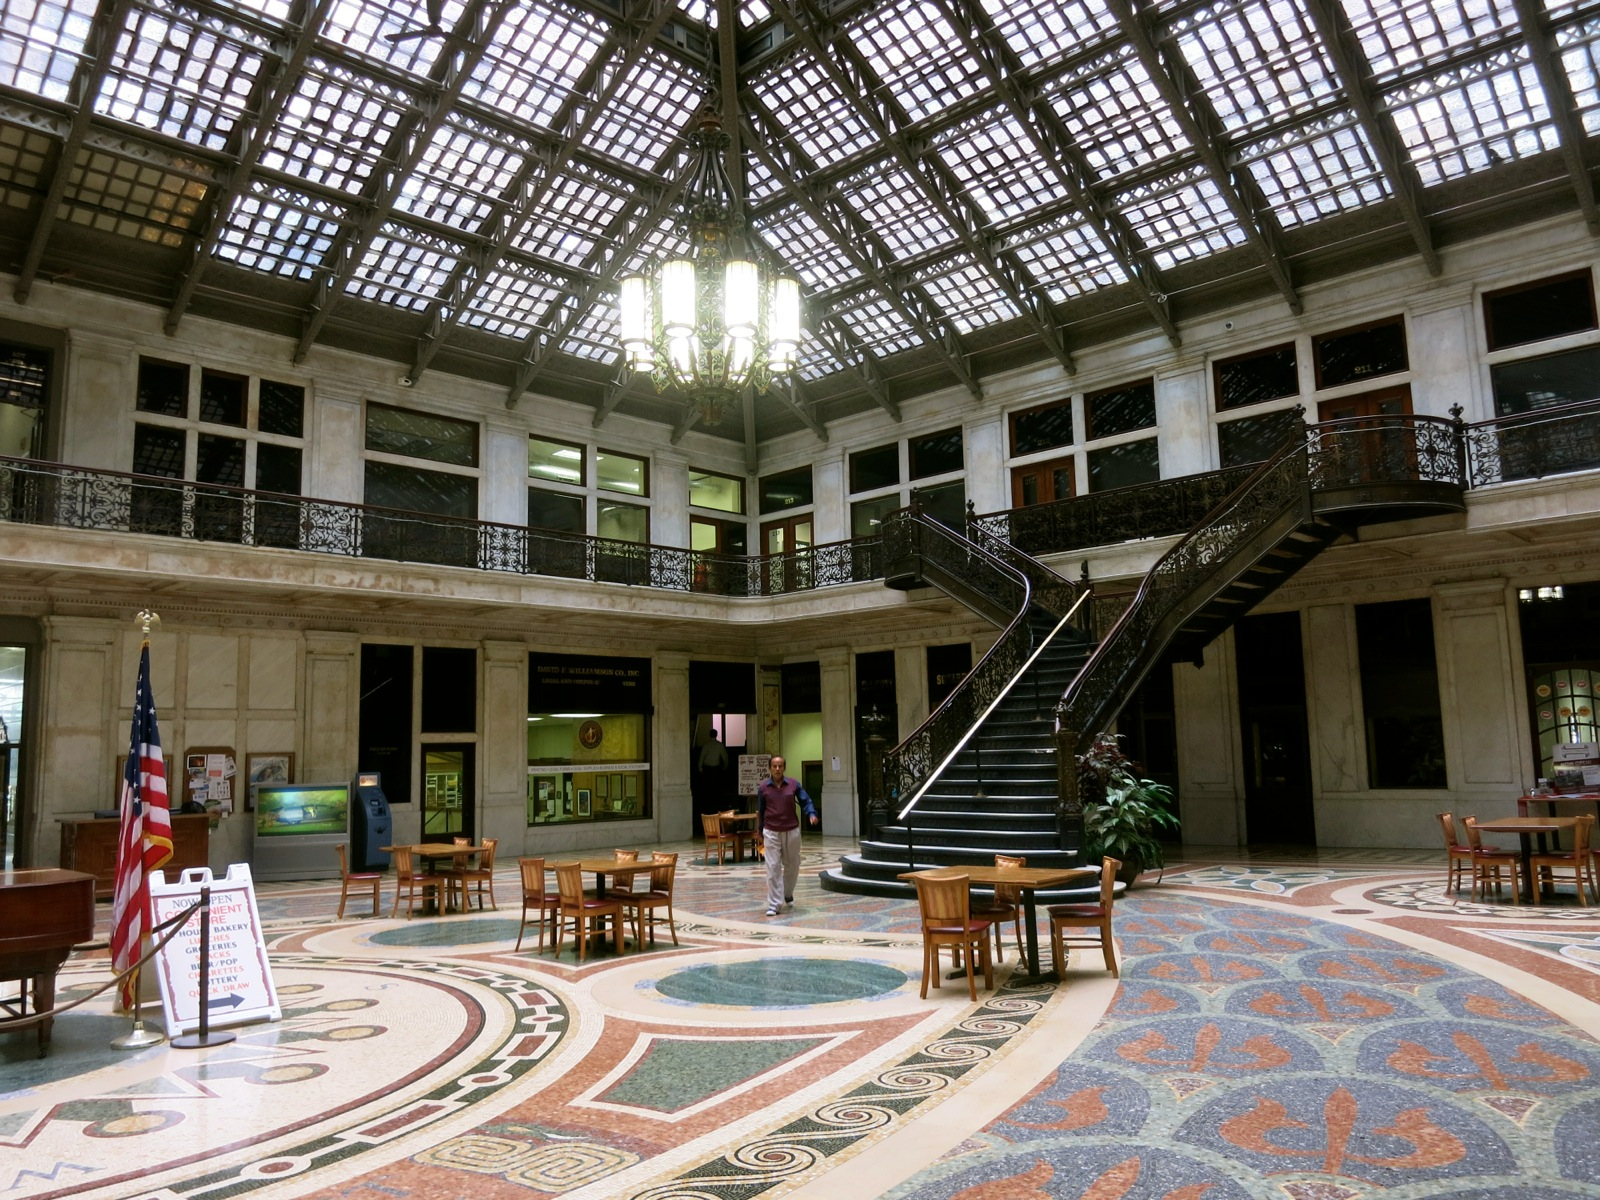 Ellicott Square Building Interior, Buffalo NY